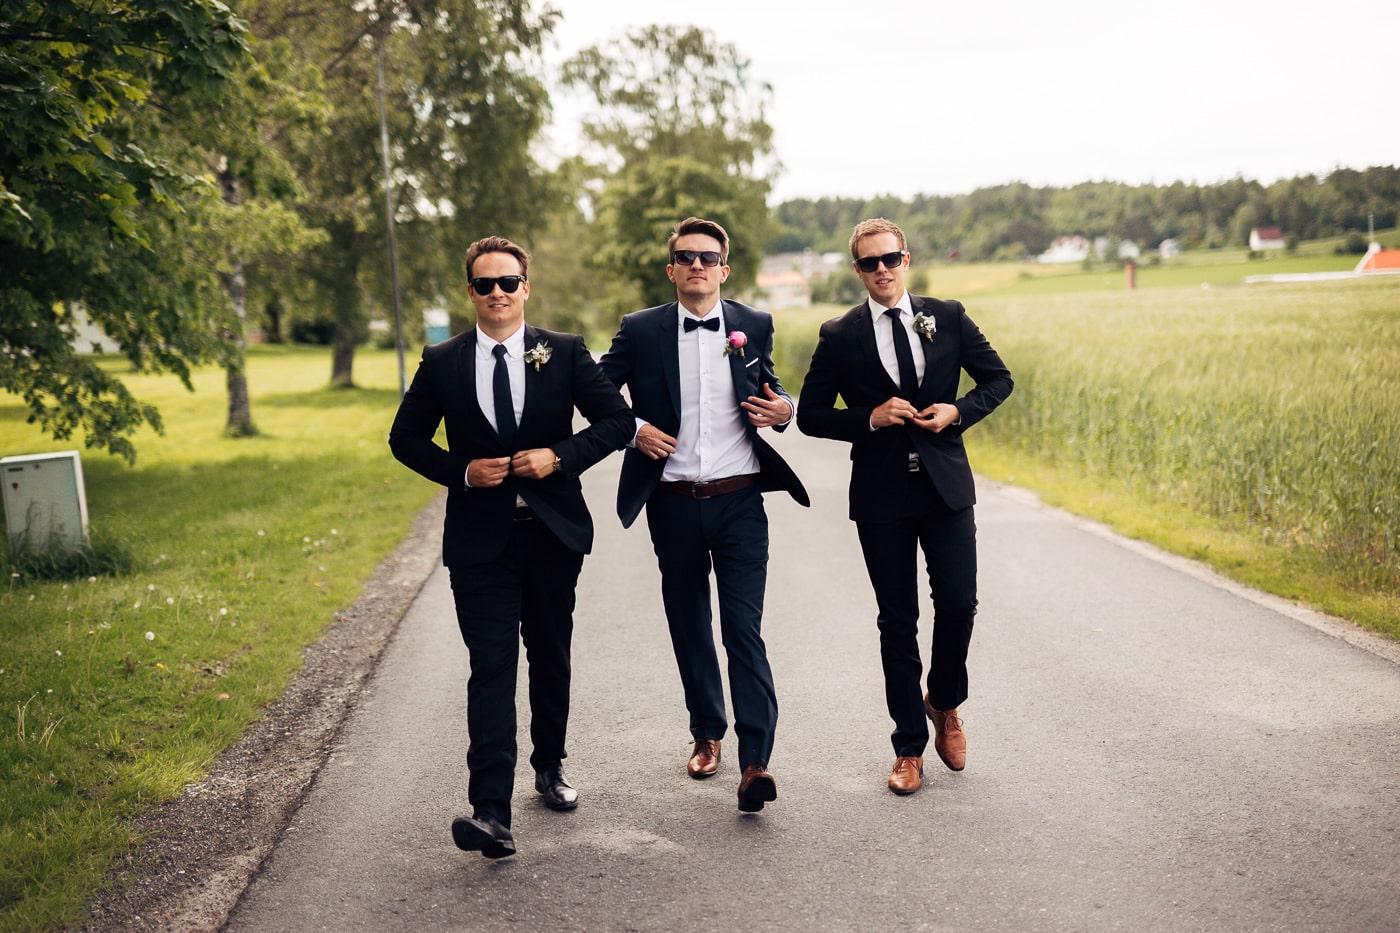 Karoline & Andreas - bryllup i Østfold med magiske detaljer Bryllup Fredrikstad Fotograf 51